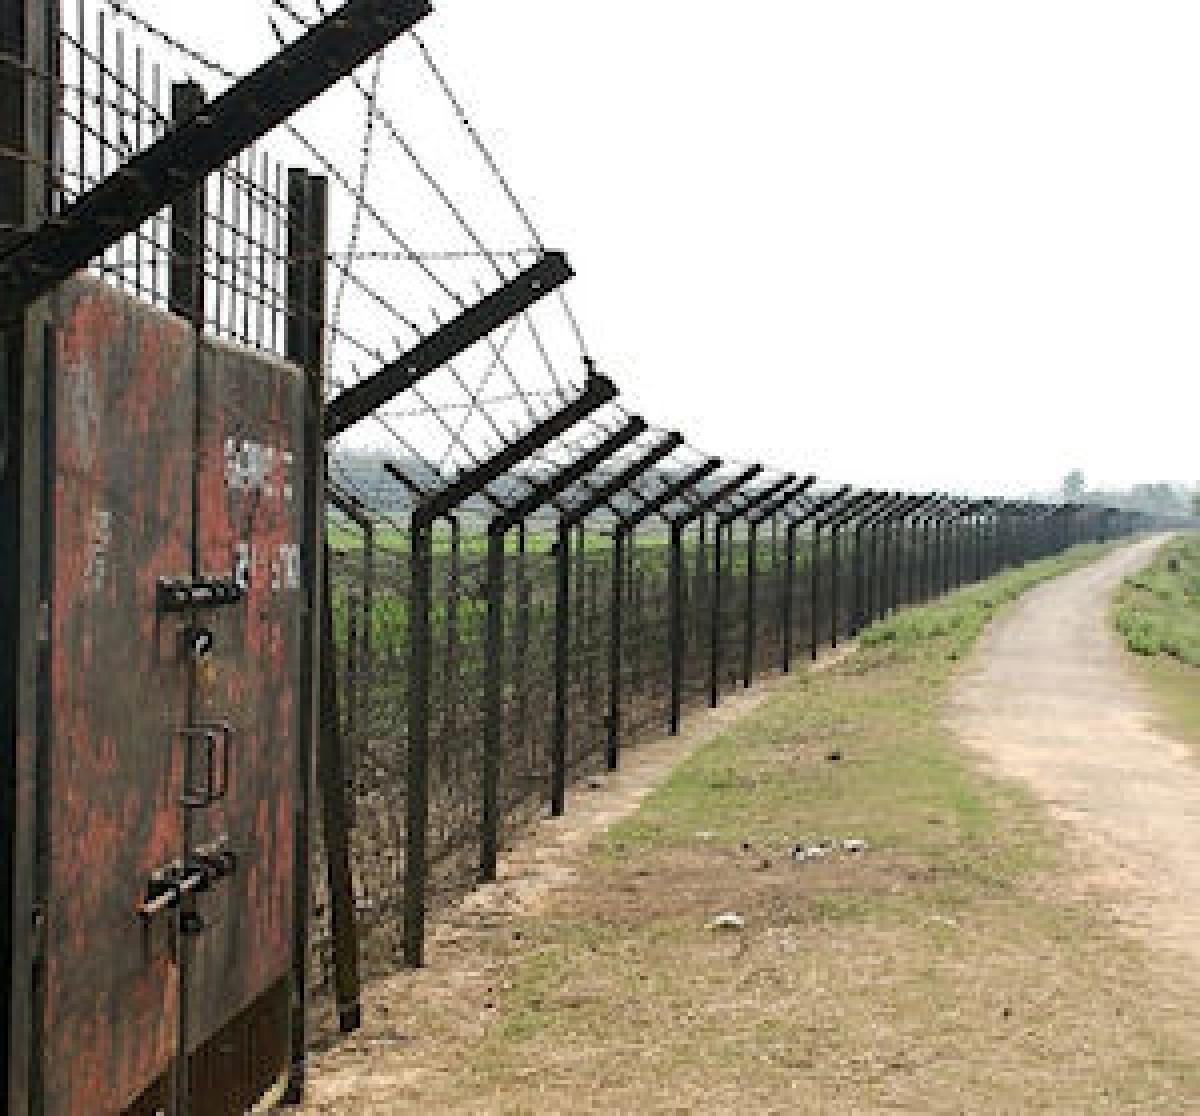 India-Bangladesh border most vulnerable to drug smuggling